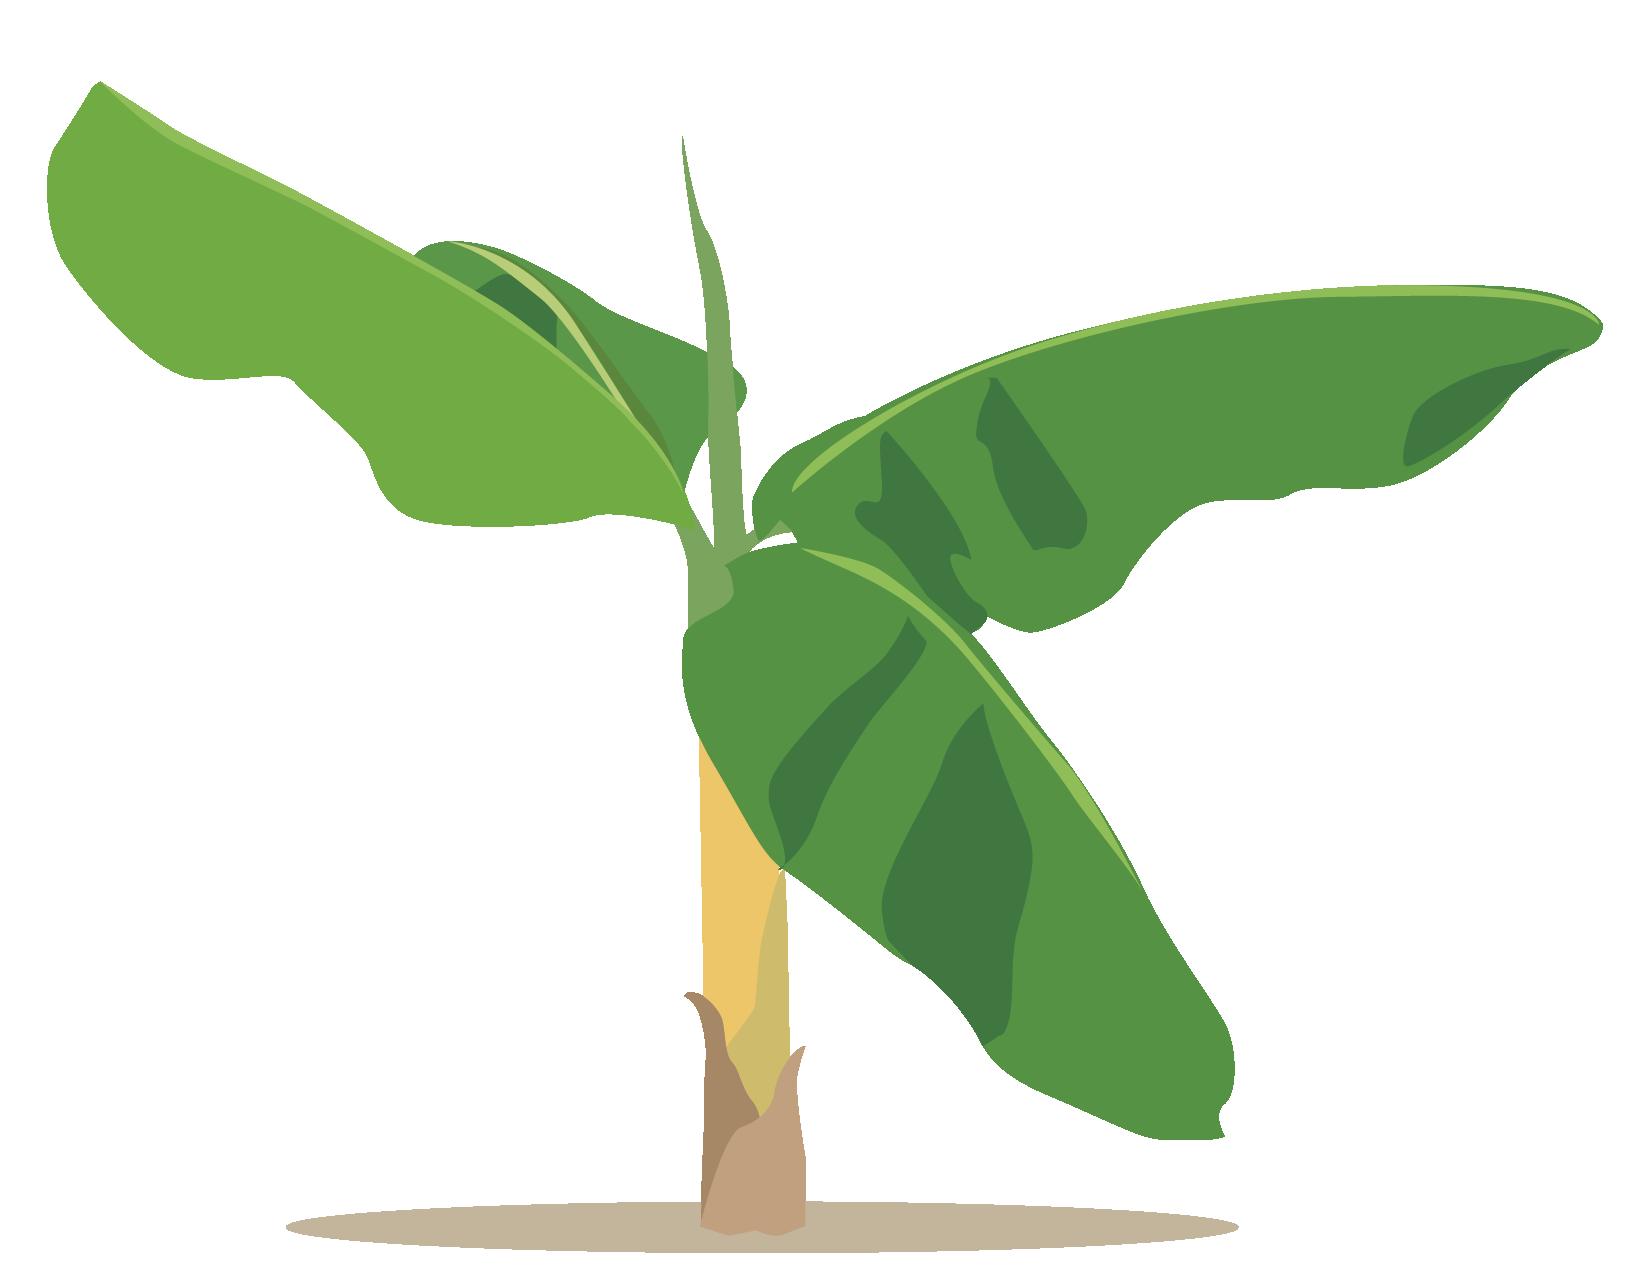 Dibujo 02 Matita De Platano Lgallp Banana Wallpaper Plant Leaves Plants